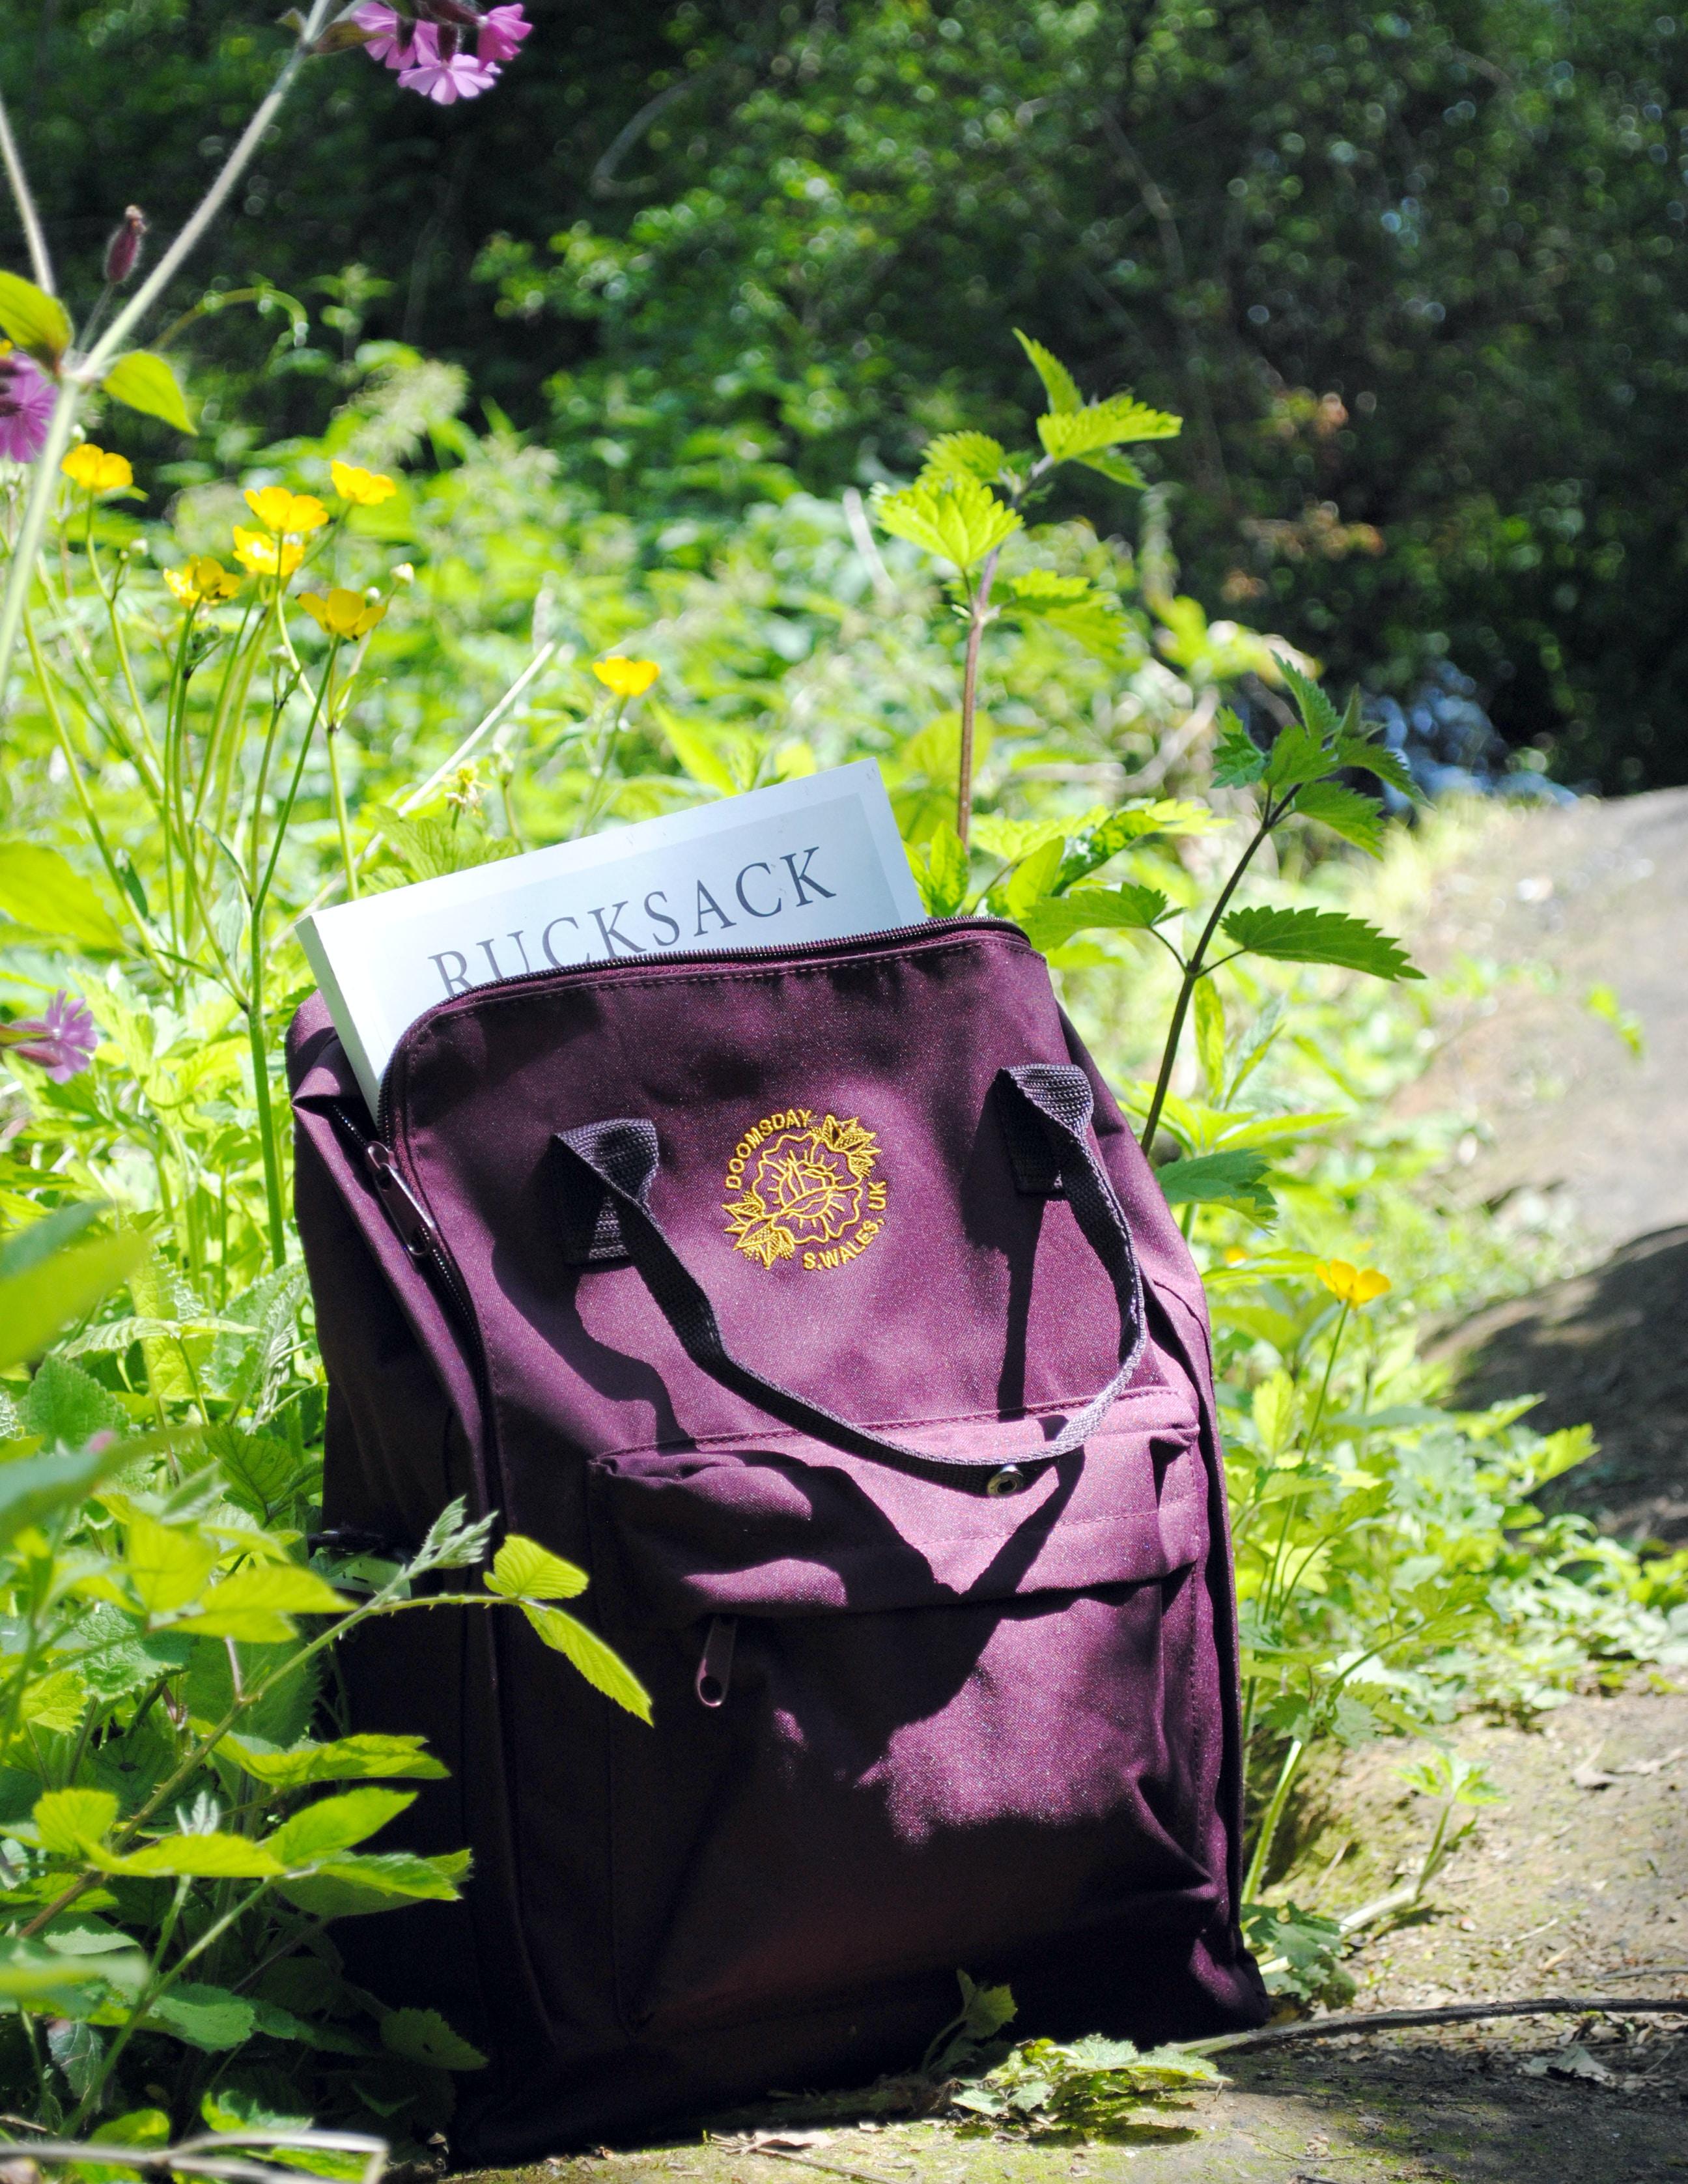 purple leather backpack beside petaled flower